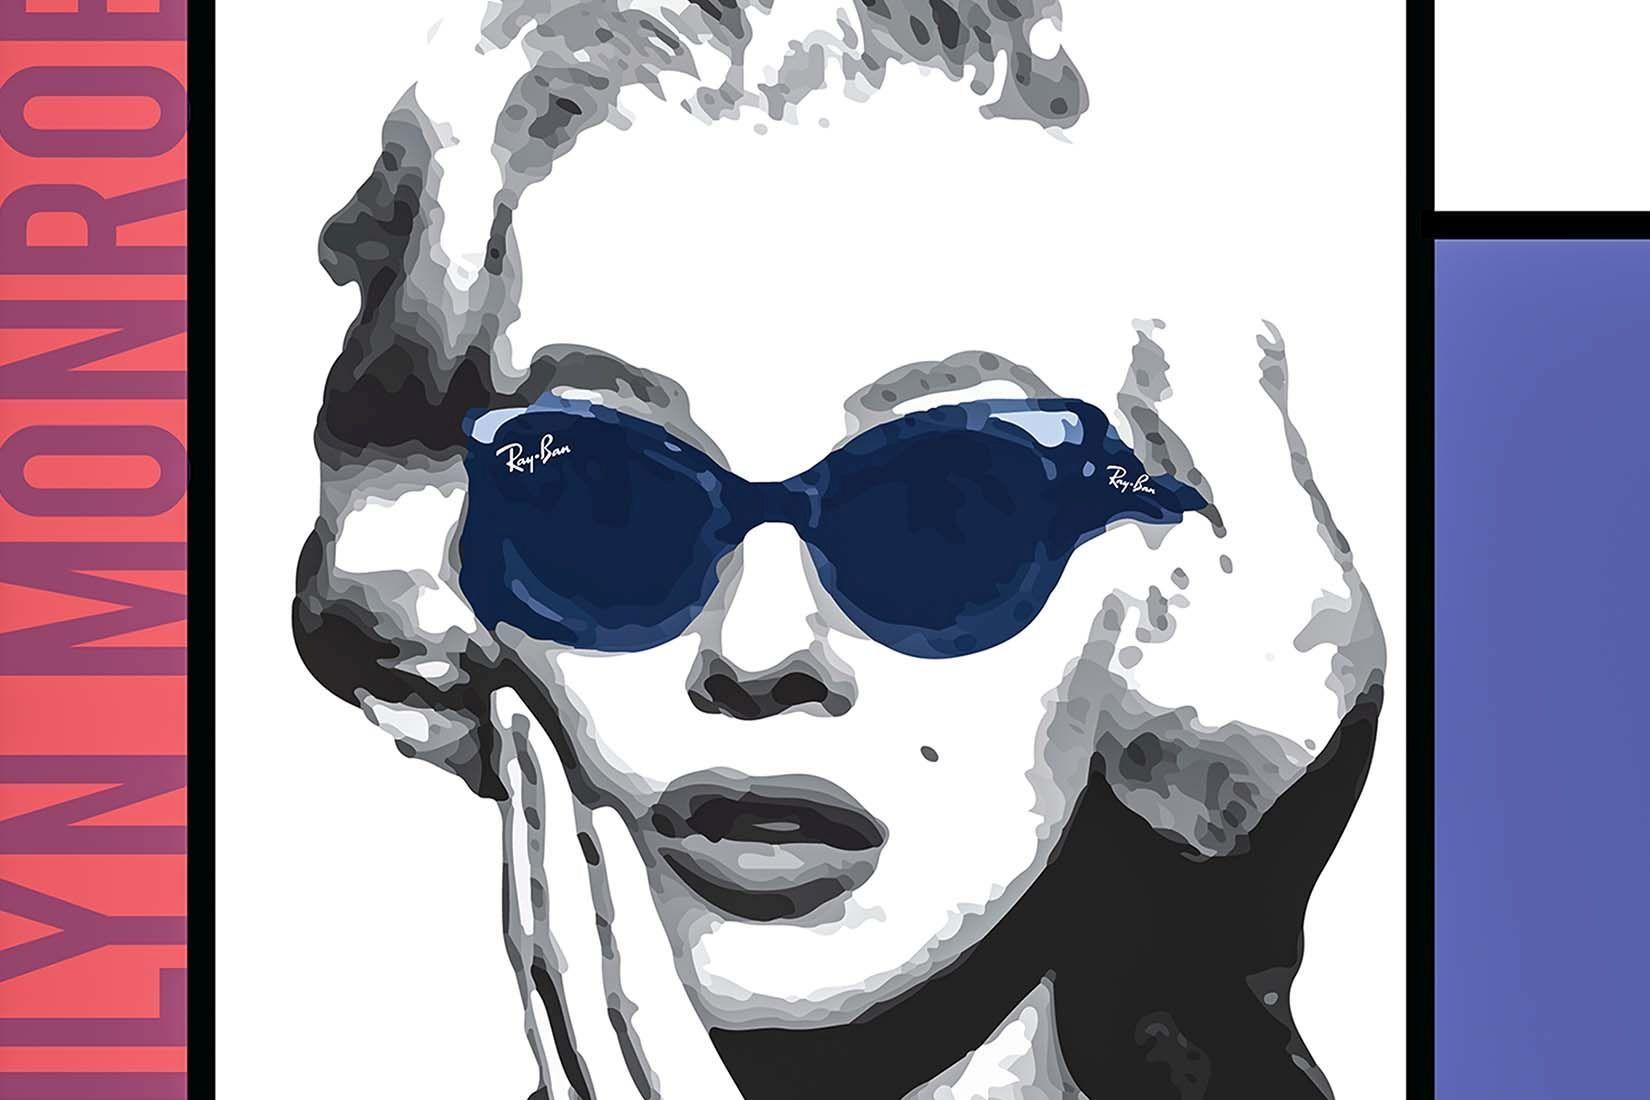 Ray-Ban Sunglasses Poster 0 1650x1100